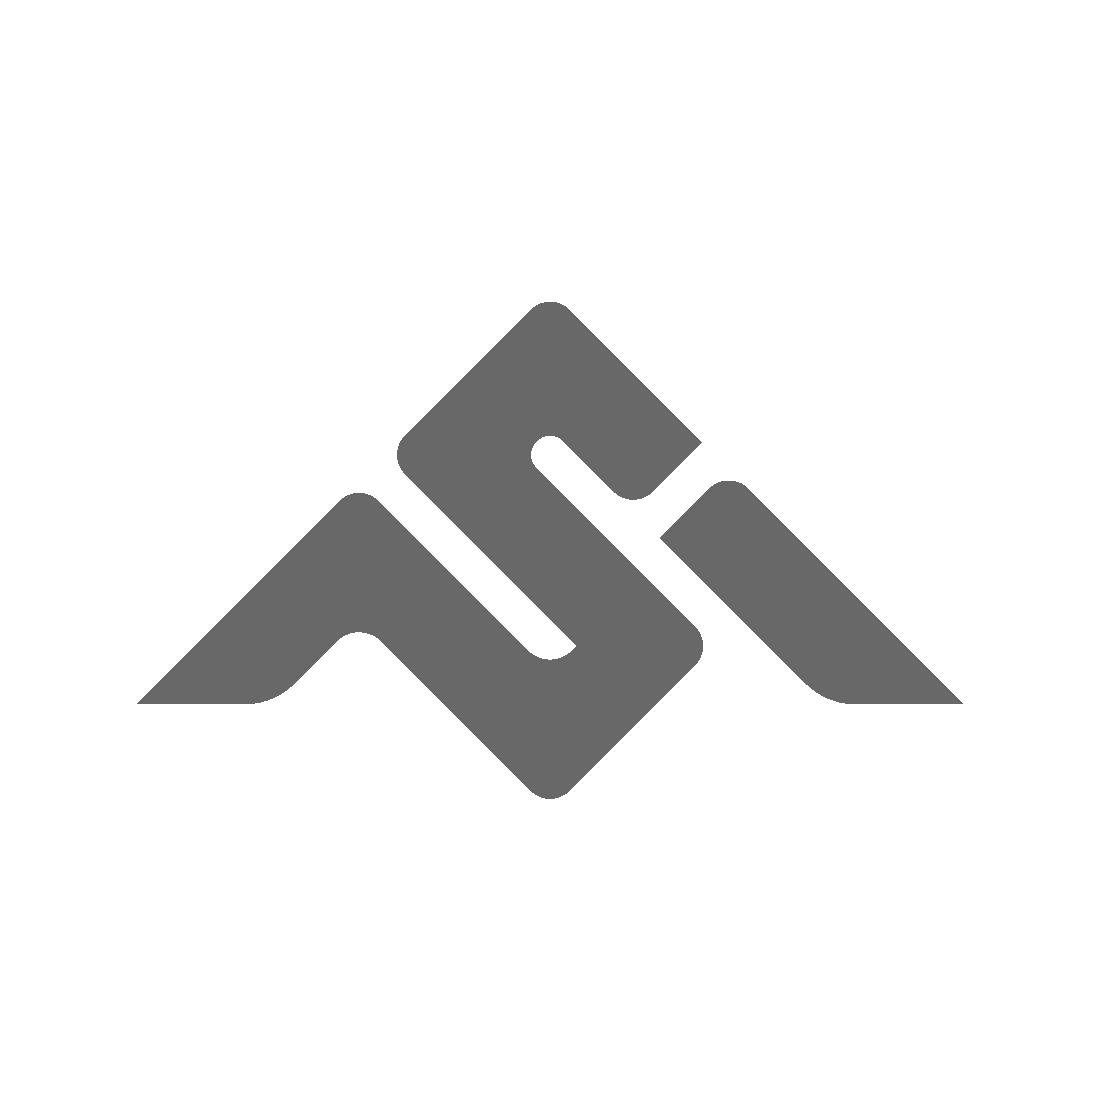 sac chaussures de ski amplifi sportmania sportmania. Black Bedroom Furniture Sets. Home Design Ideas